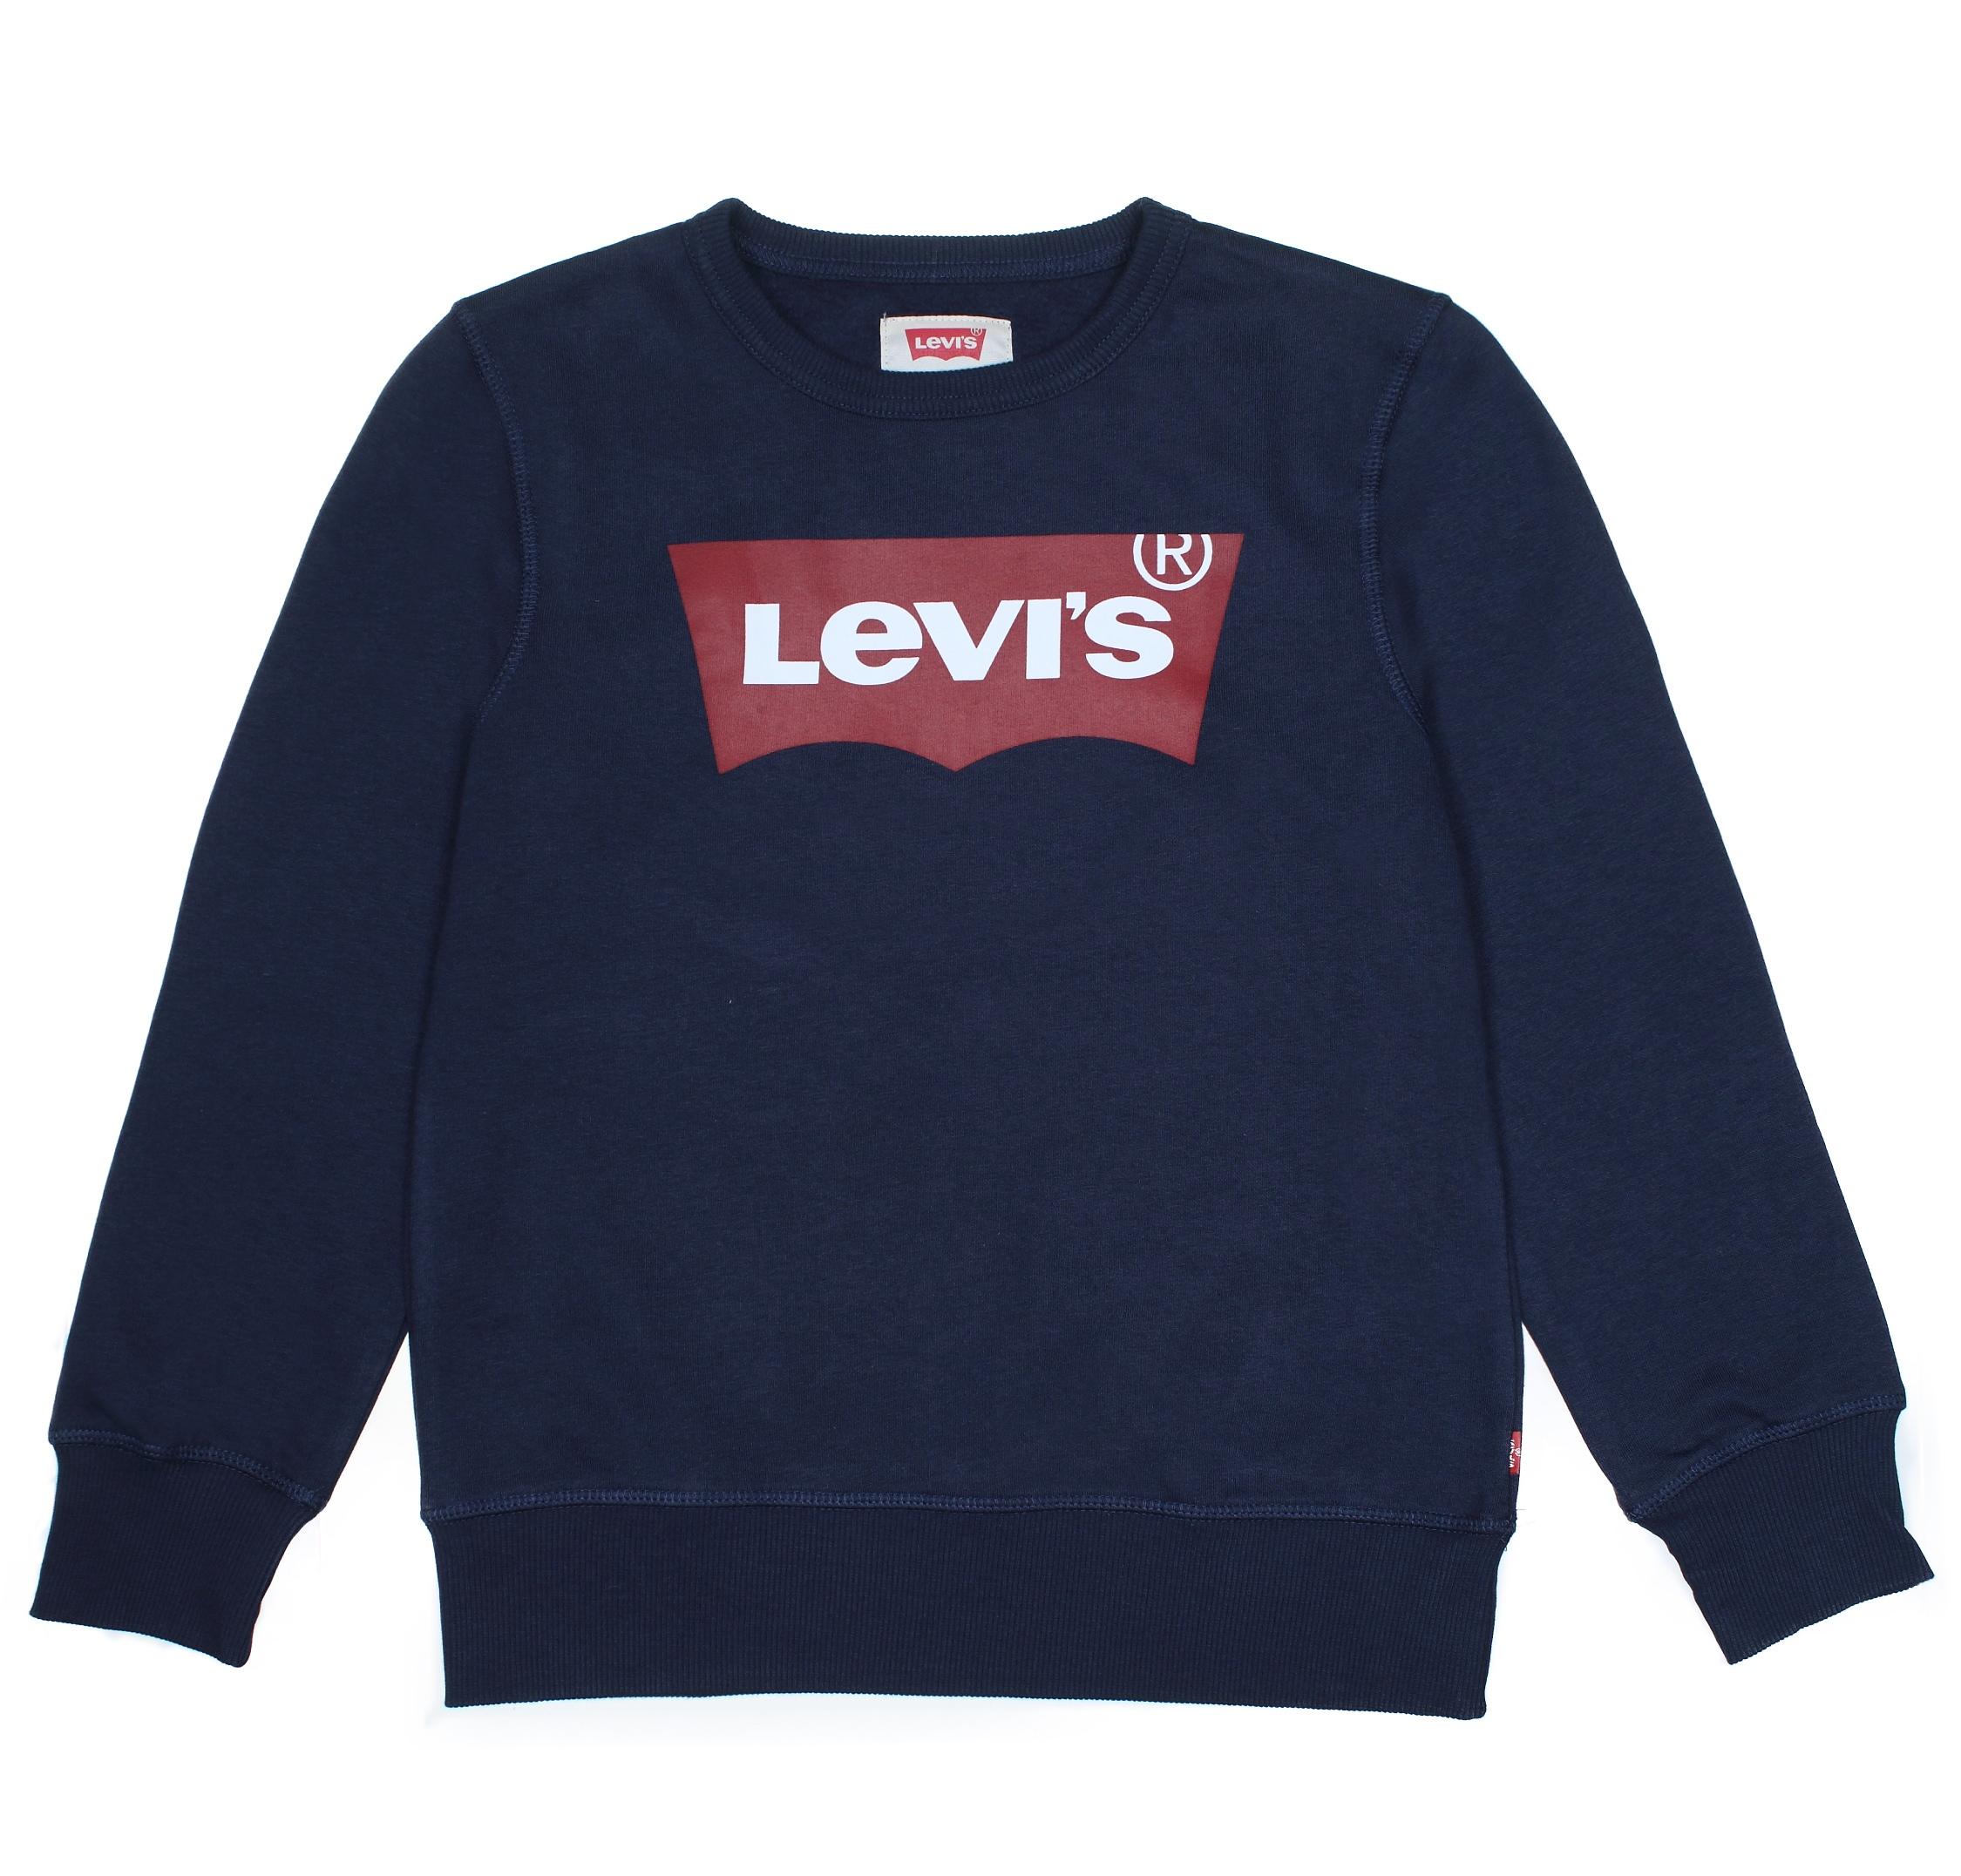 https://www.leadermode.com/184309/levi-s-kids-9079-u09-dress-blue.jpg